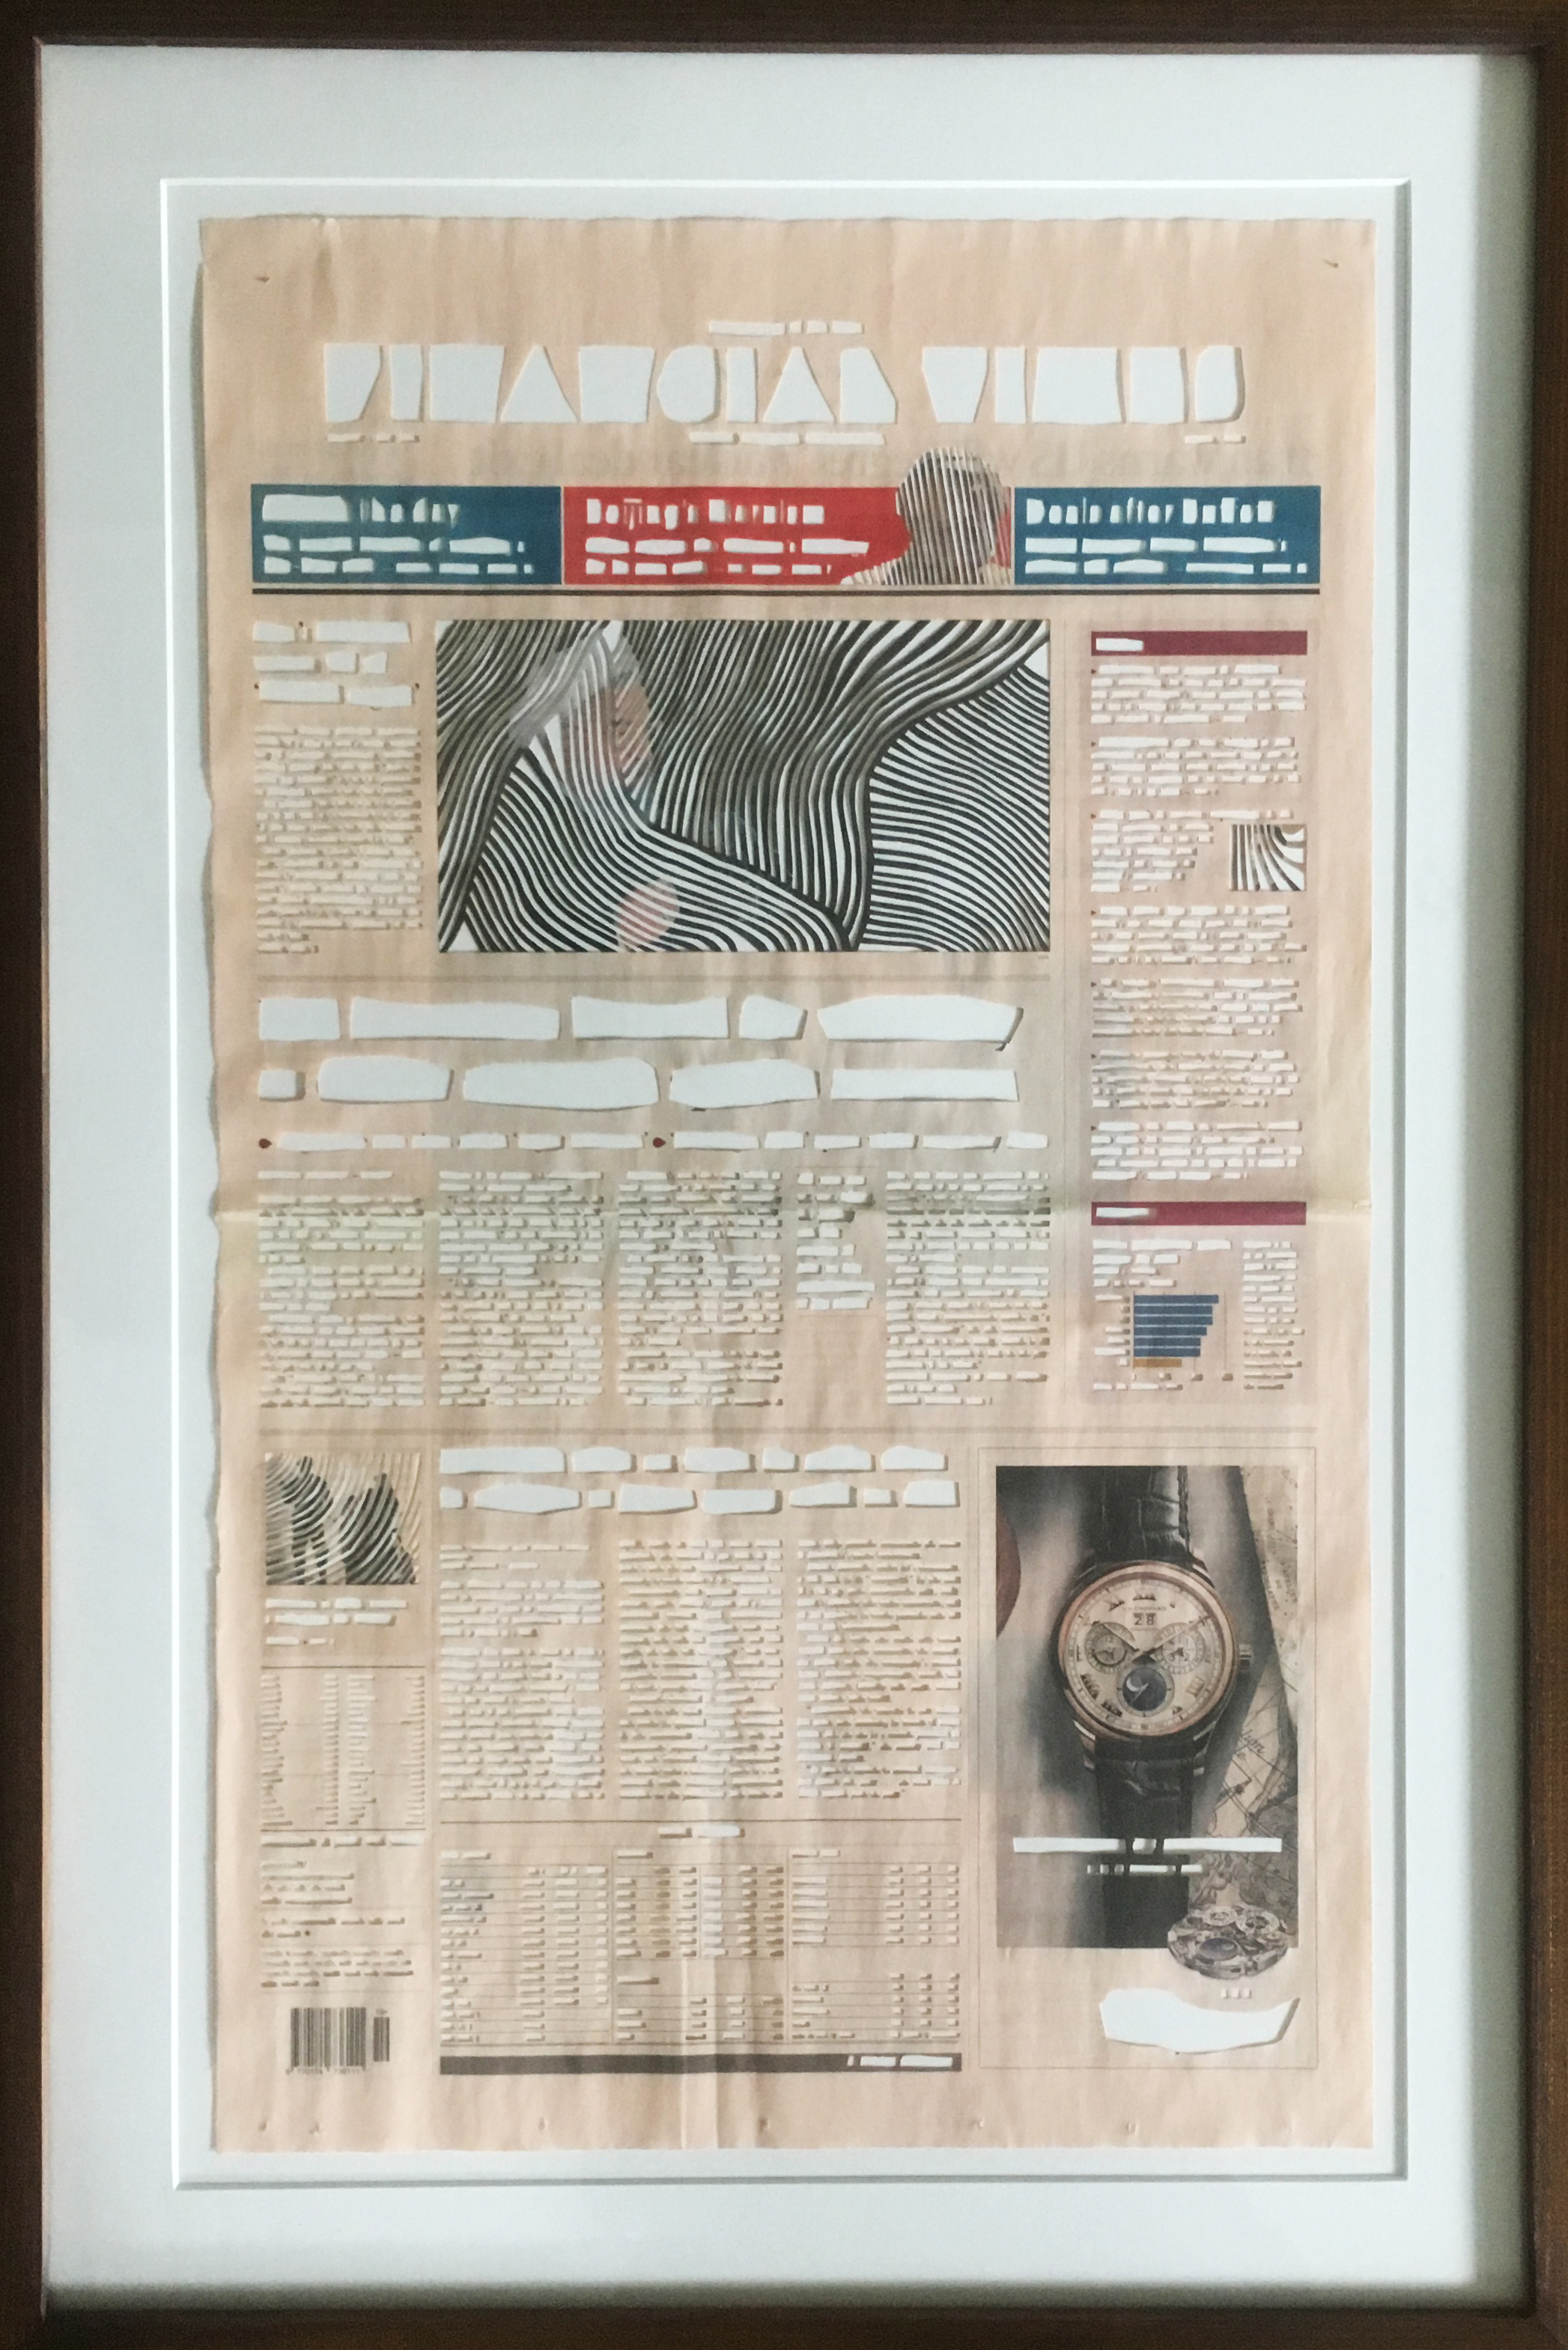 Historic Regret (Timepieces of Distinction), 2018, Newspaper cutout, 57.5 x 35 cm.